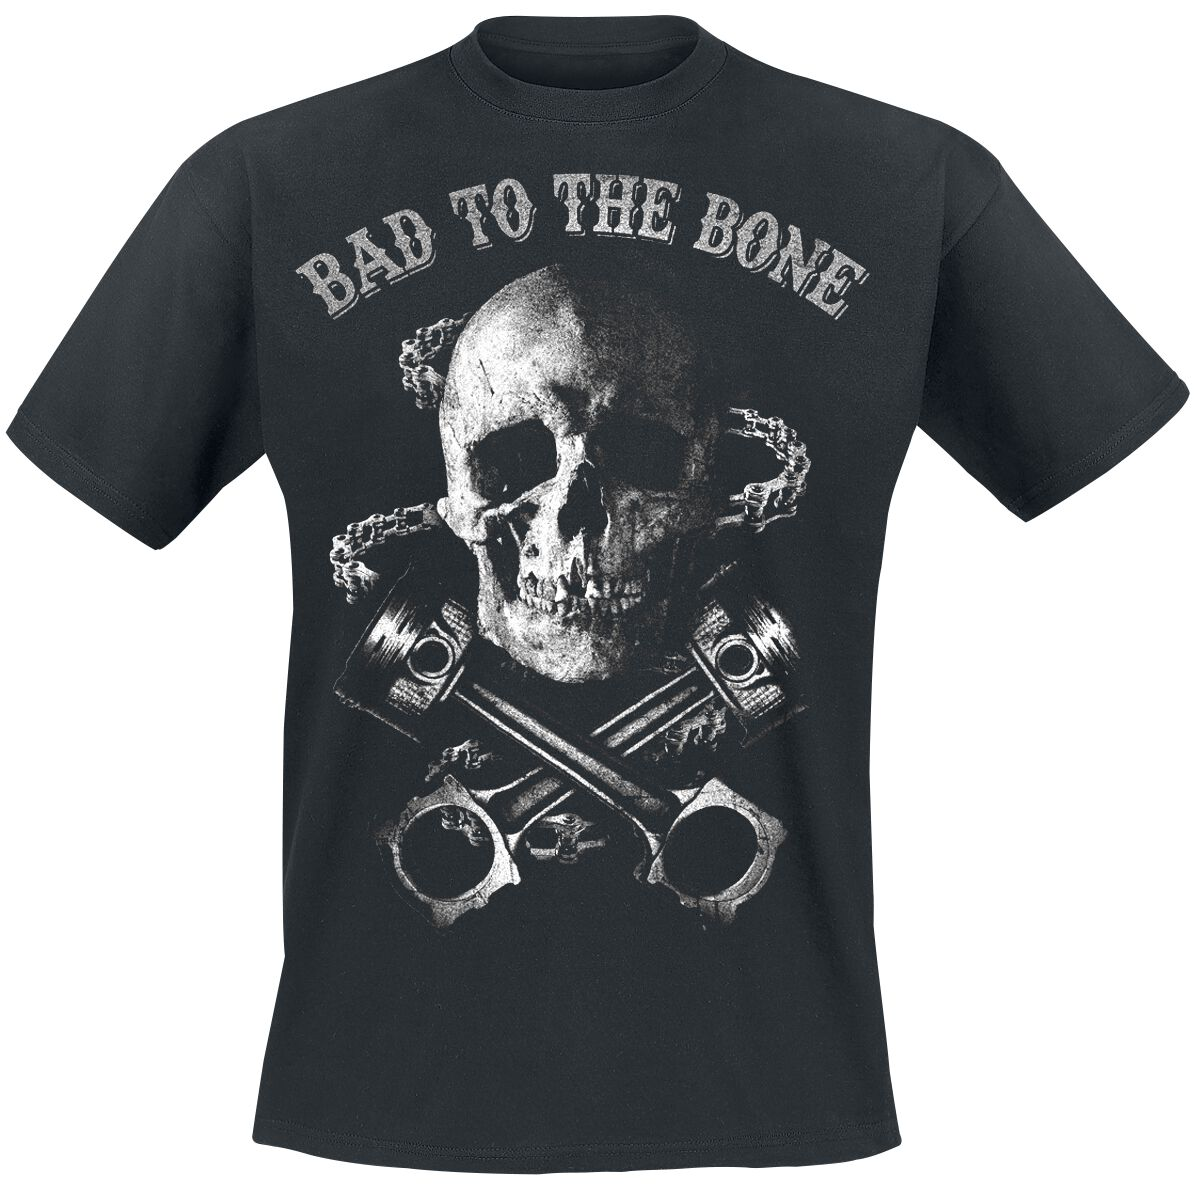 Motyw - Koszulki - T-Shirt Bad To The Bone T-Shirt czarny - 359825